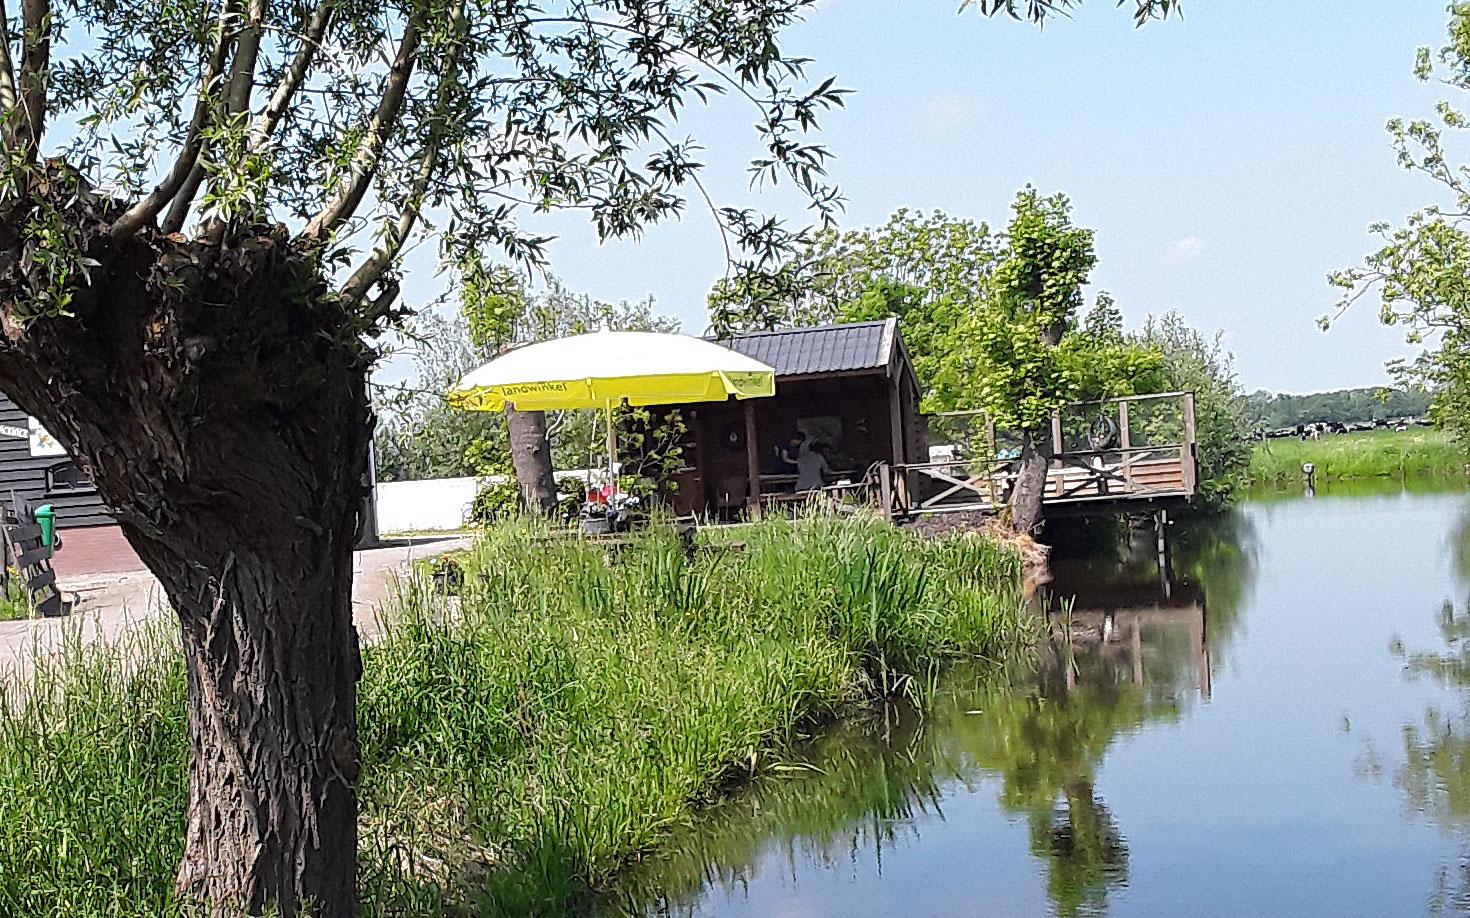 picknick rustwat wandelroute noordzijde landwinkel polsbroek 1